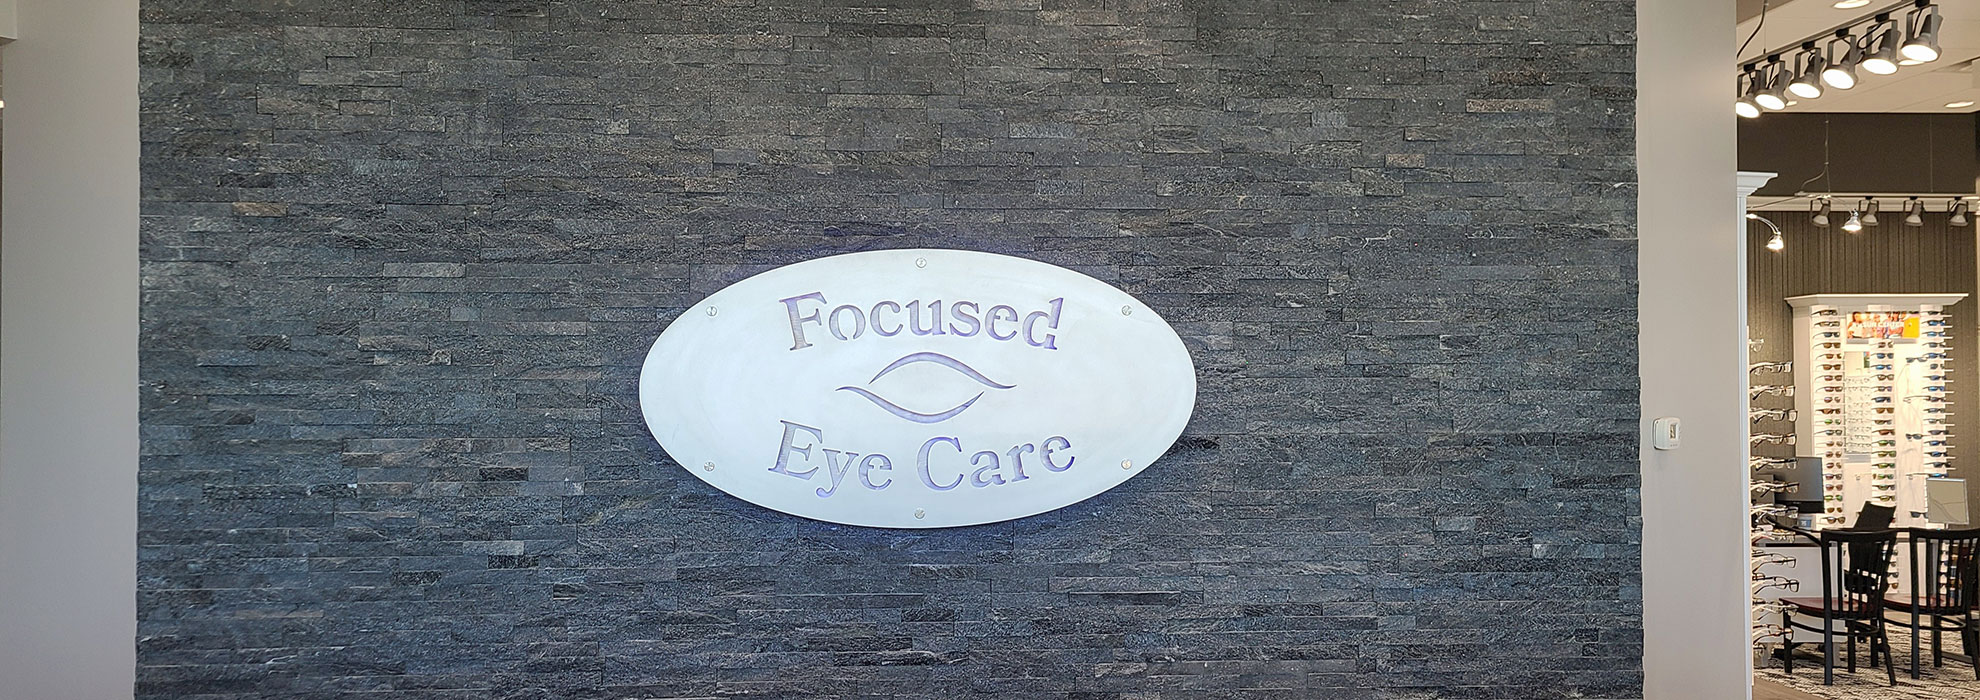 Focused Eye Care Front Desk